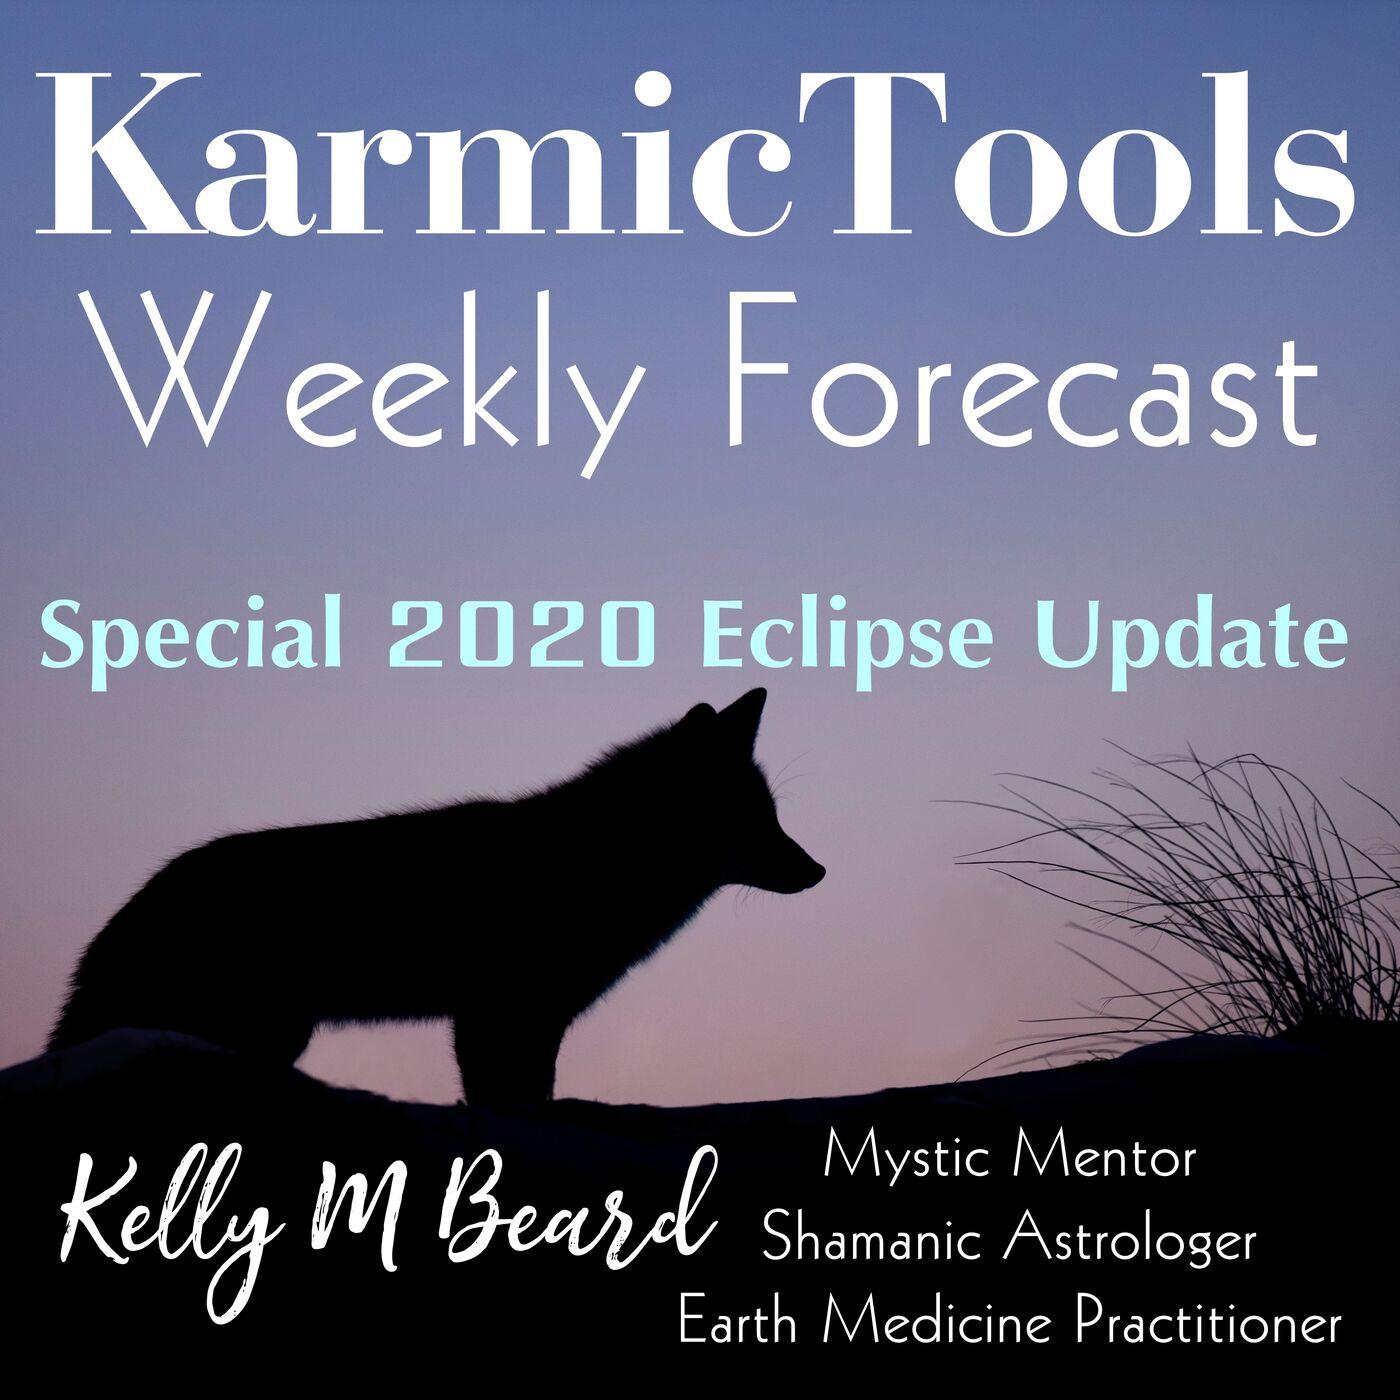 Special 2020 Eclipse Update